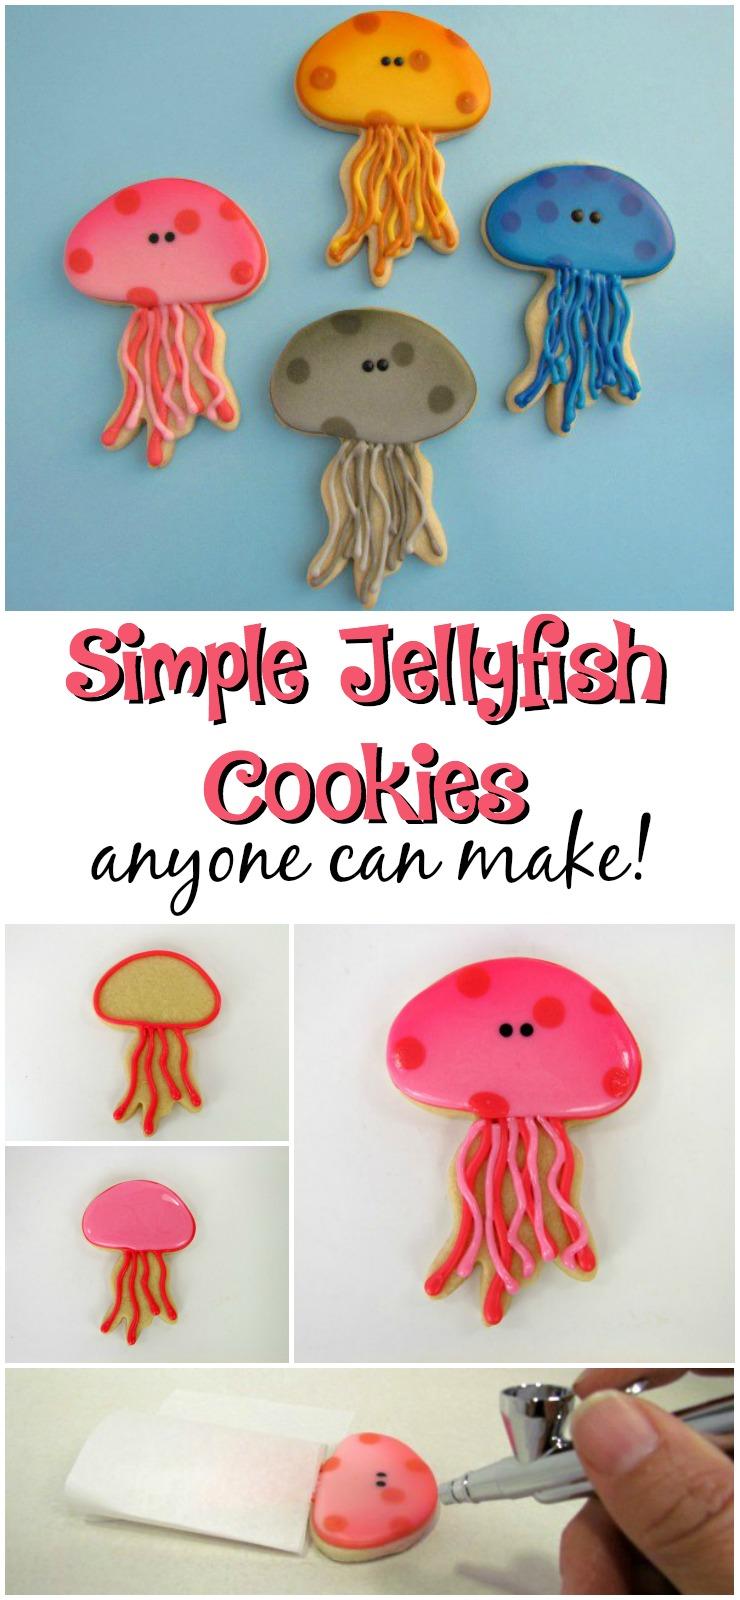 Simple Jellyfish Cookies anyone Can Make via www.thebearfootbaker.com